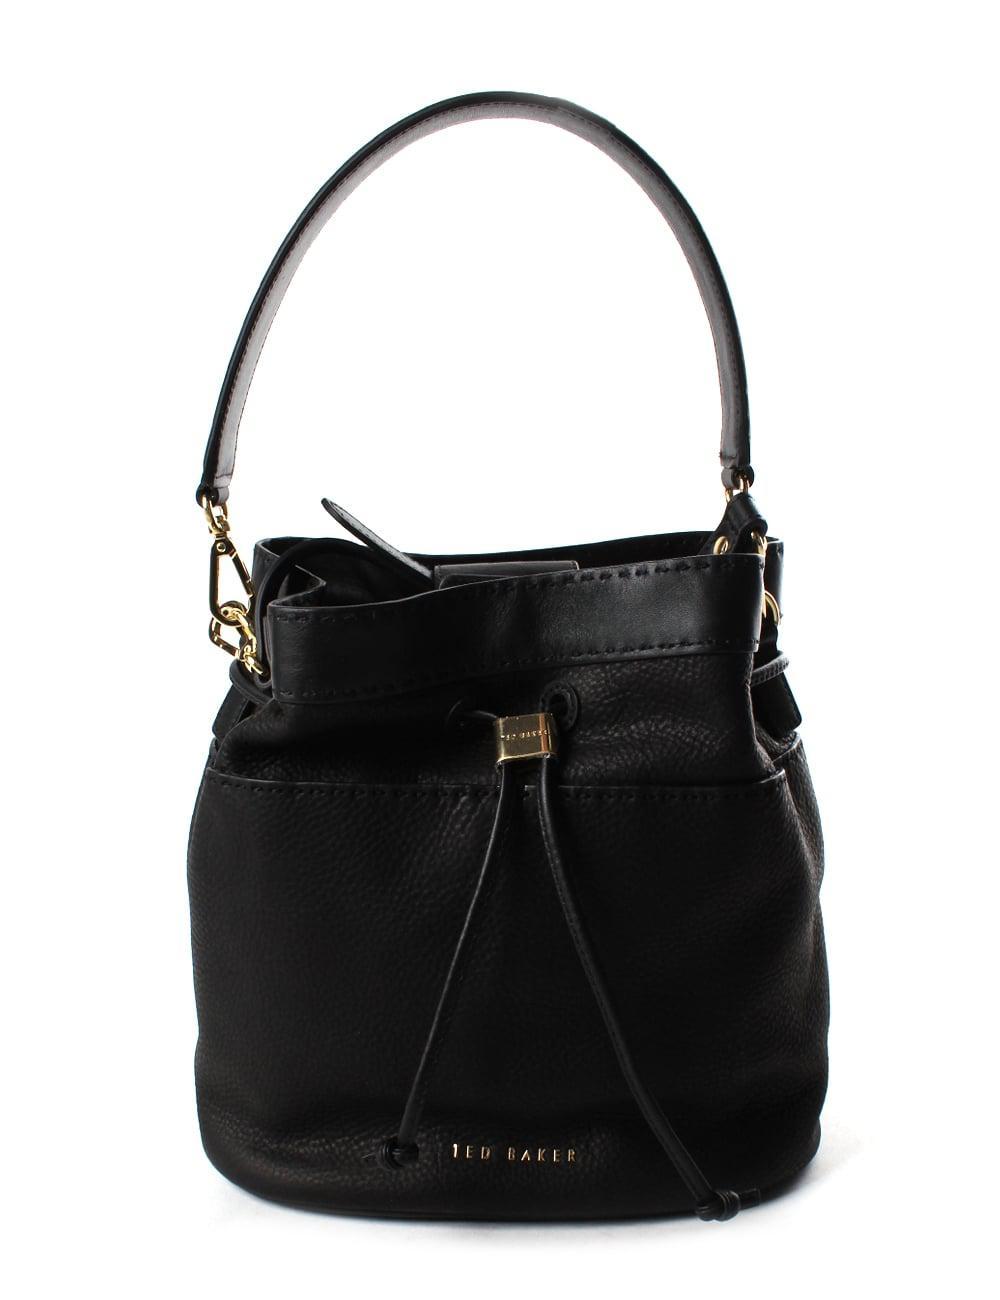 6d0336a8802b Ted Baker - Kashia Stab Stitch Women s Leather Bucket Bag Black - Lyst.  View fullscreen